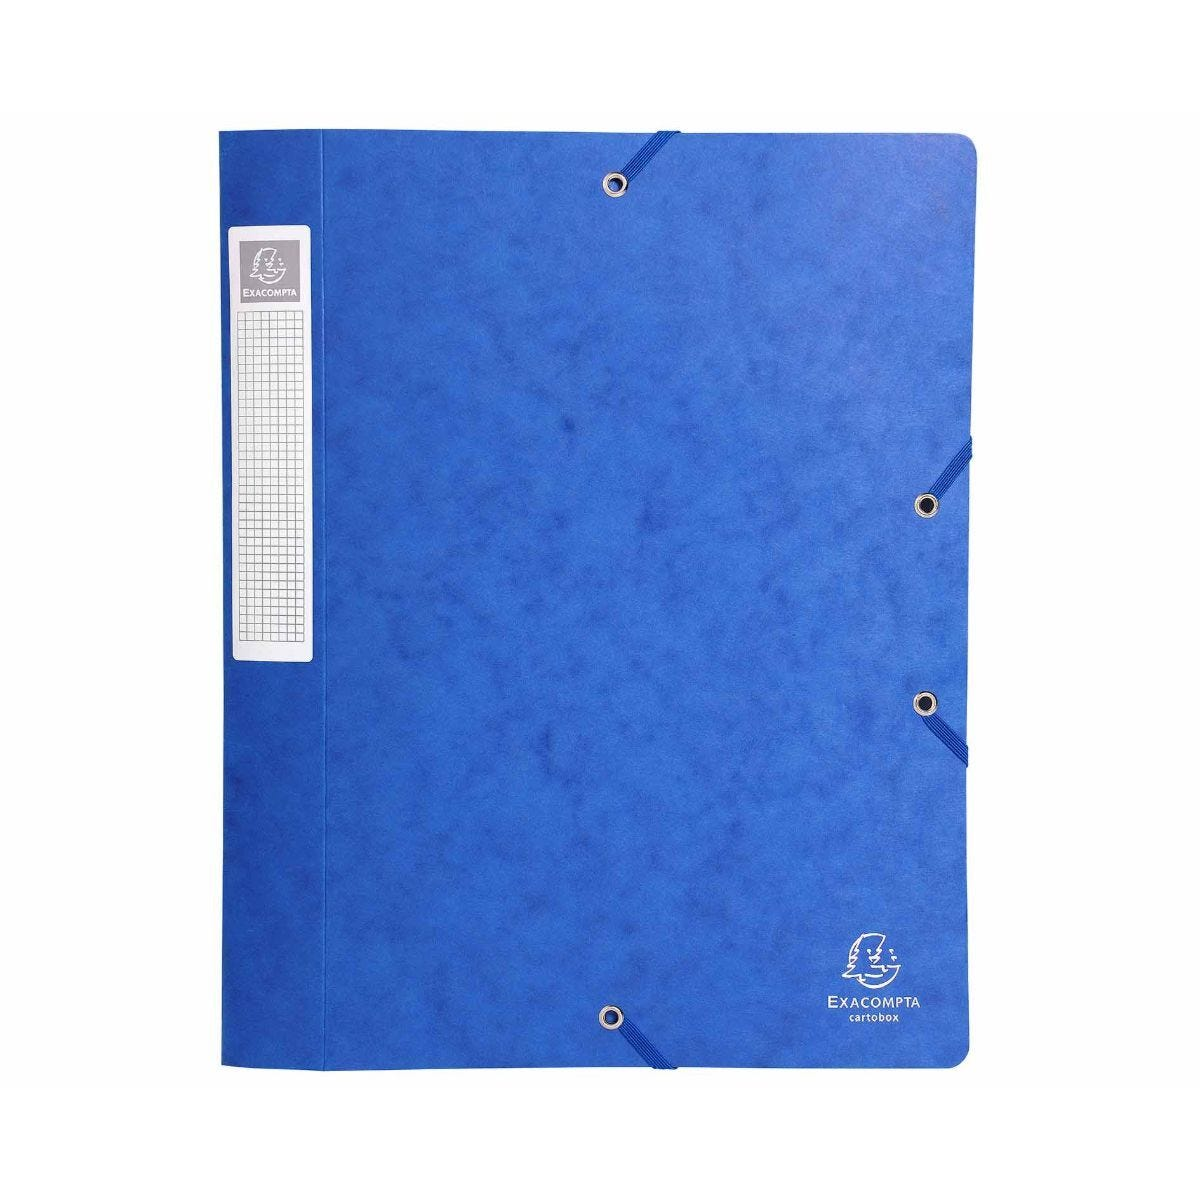 Exacompta Cartobox Box File A4 25mm Pack of 25 Blue